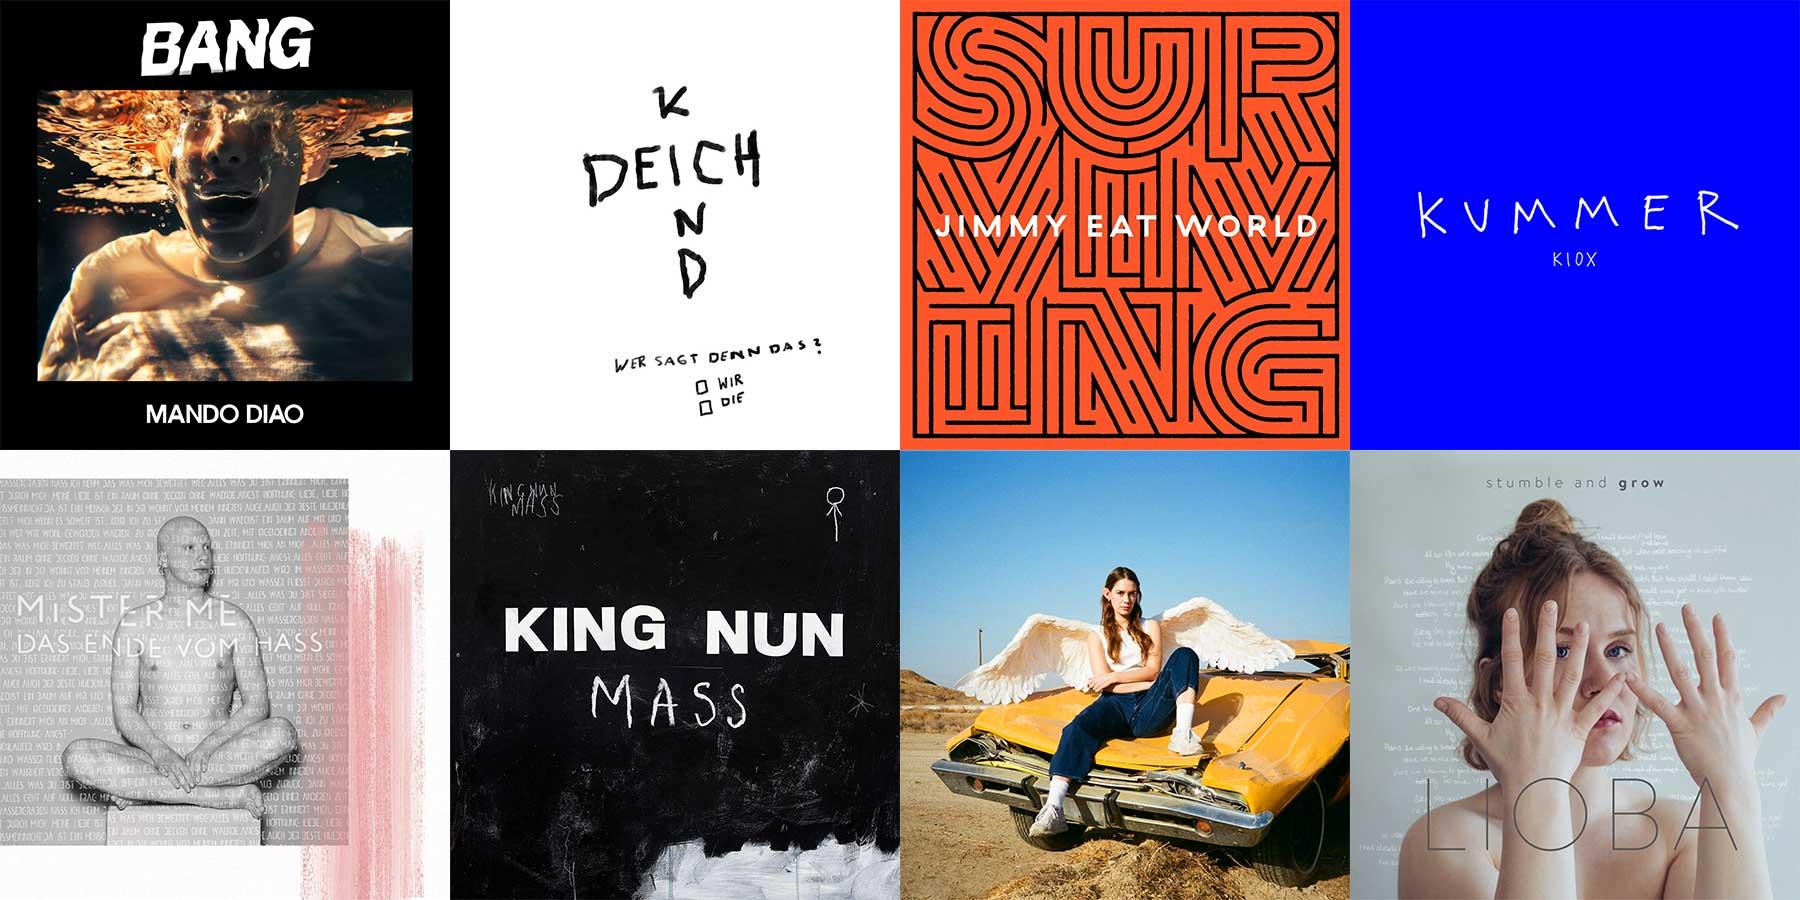 Kurzreviews: Neue Musikalben im Oktober 2019 musikalben-oktober-kurzreviews